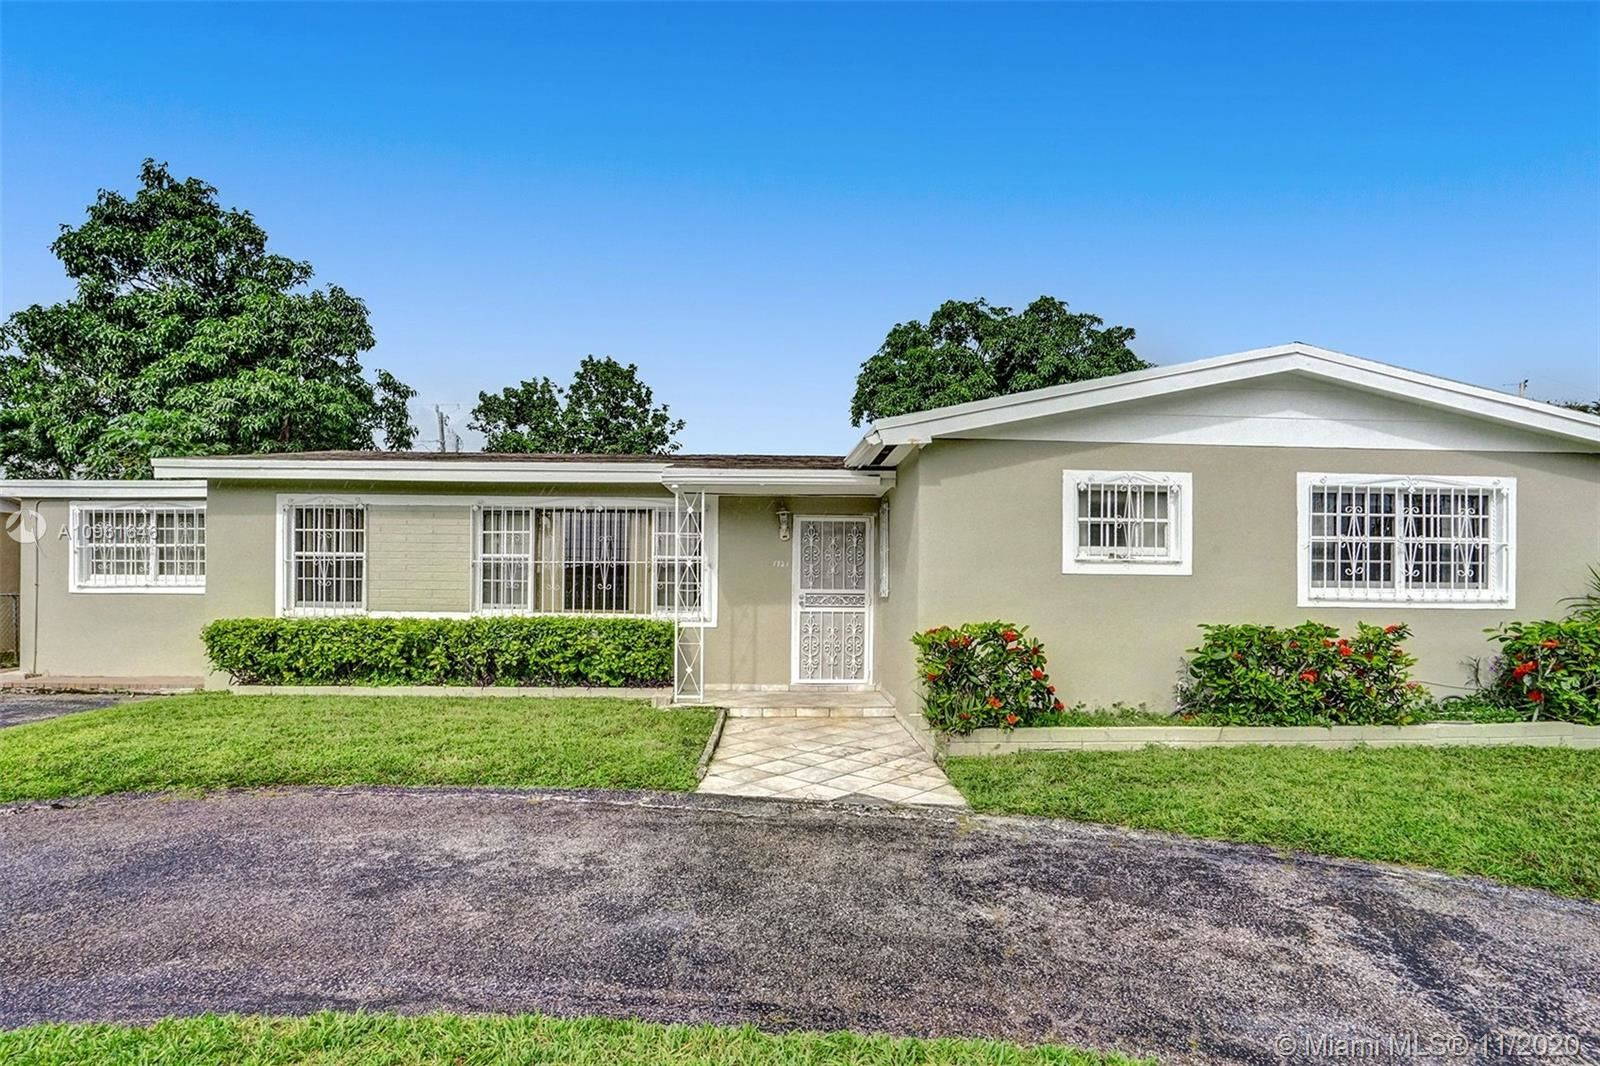 1721 NW 187 ST, Miami Gardens, FL 33056 - #: A10961646